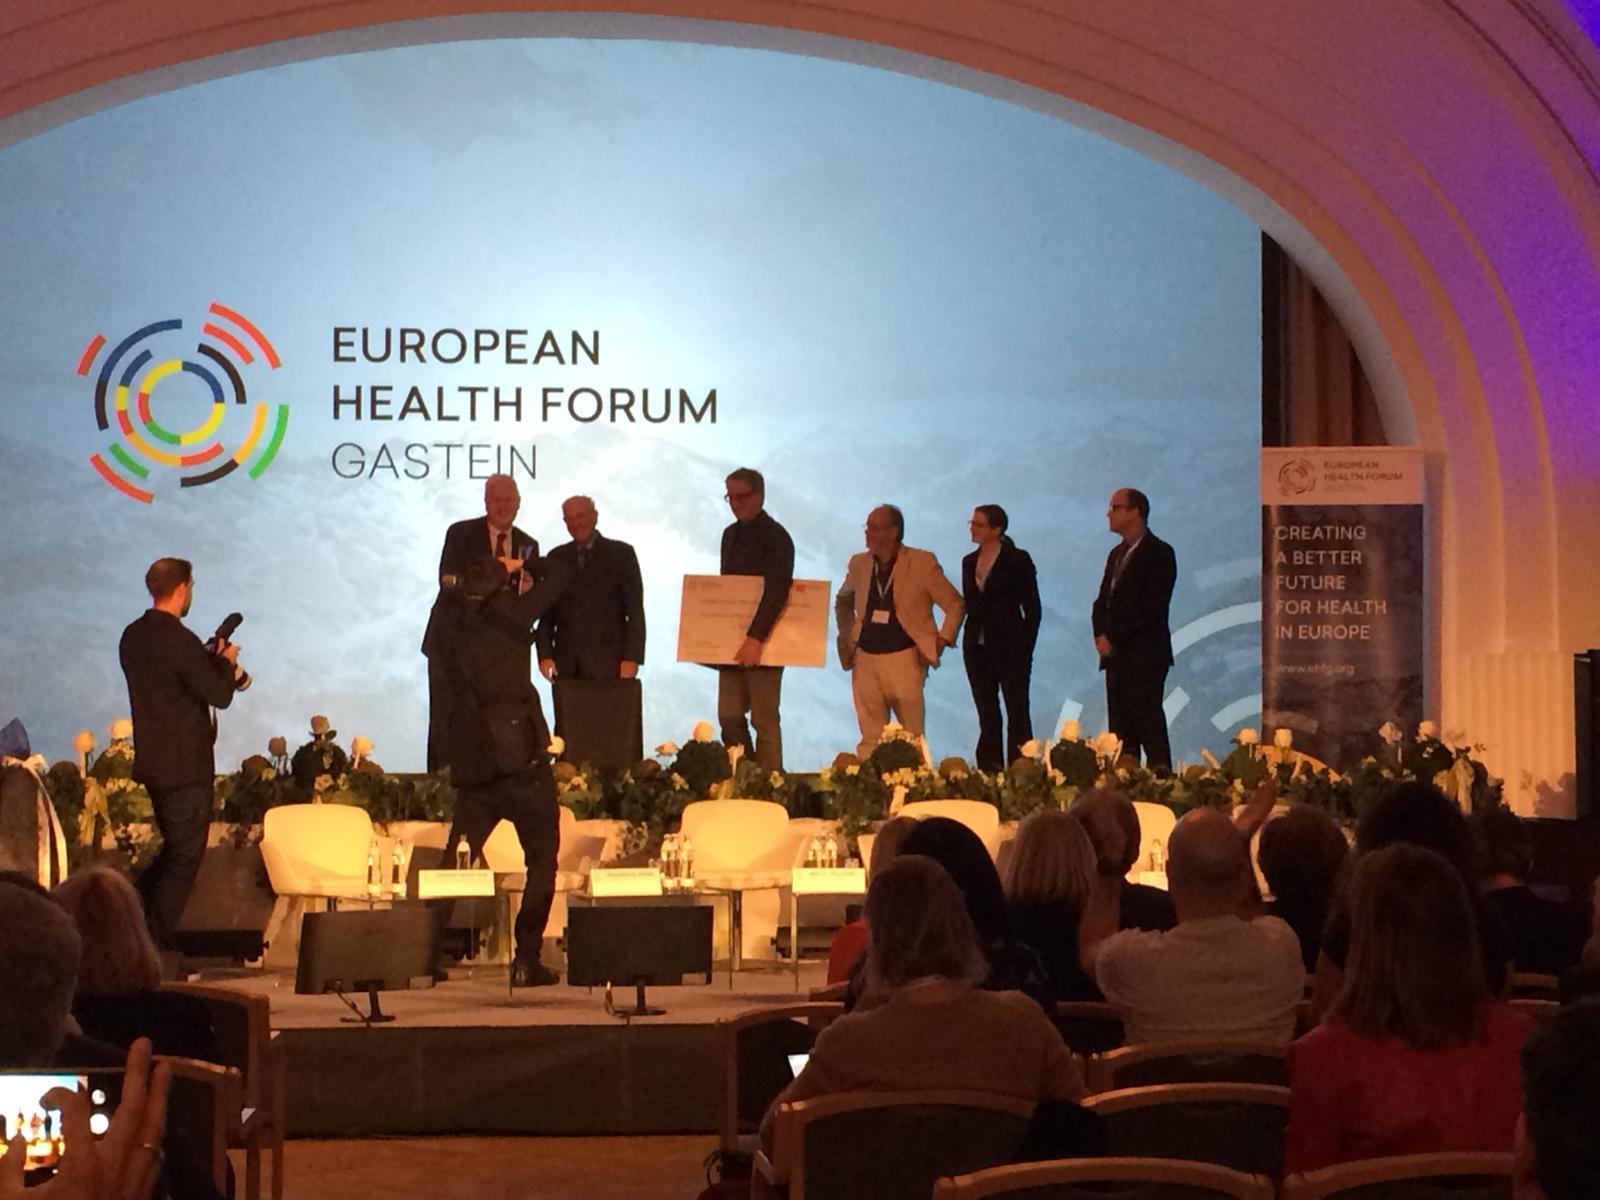 Health Forum Gastein, European Health Award 2018